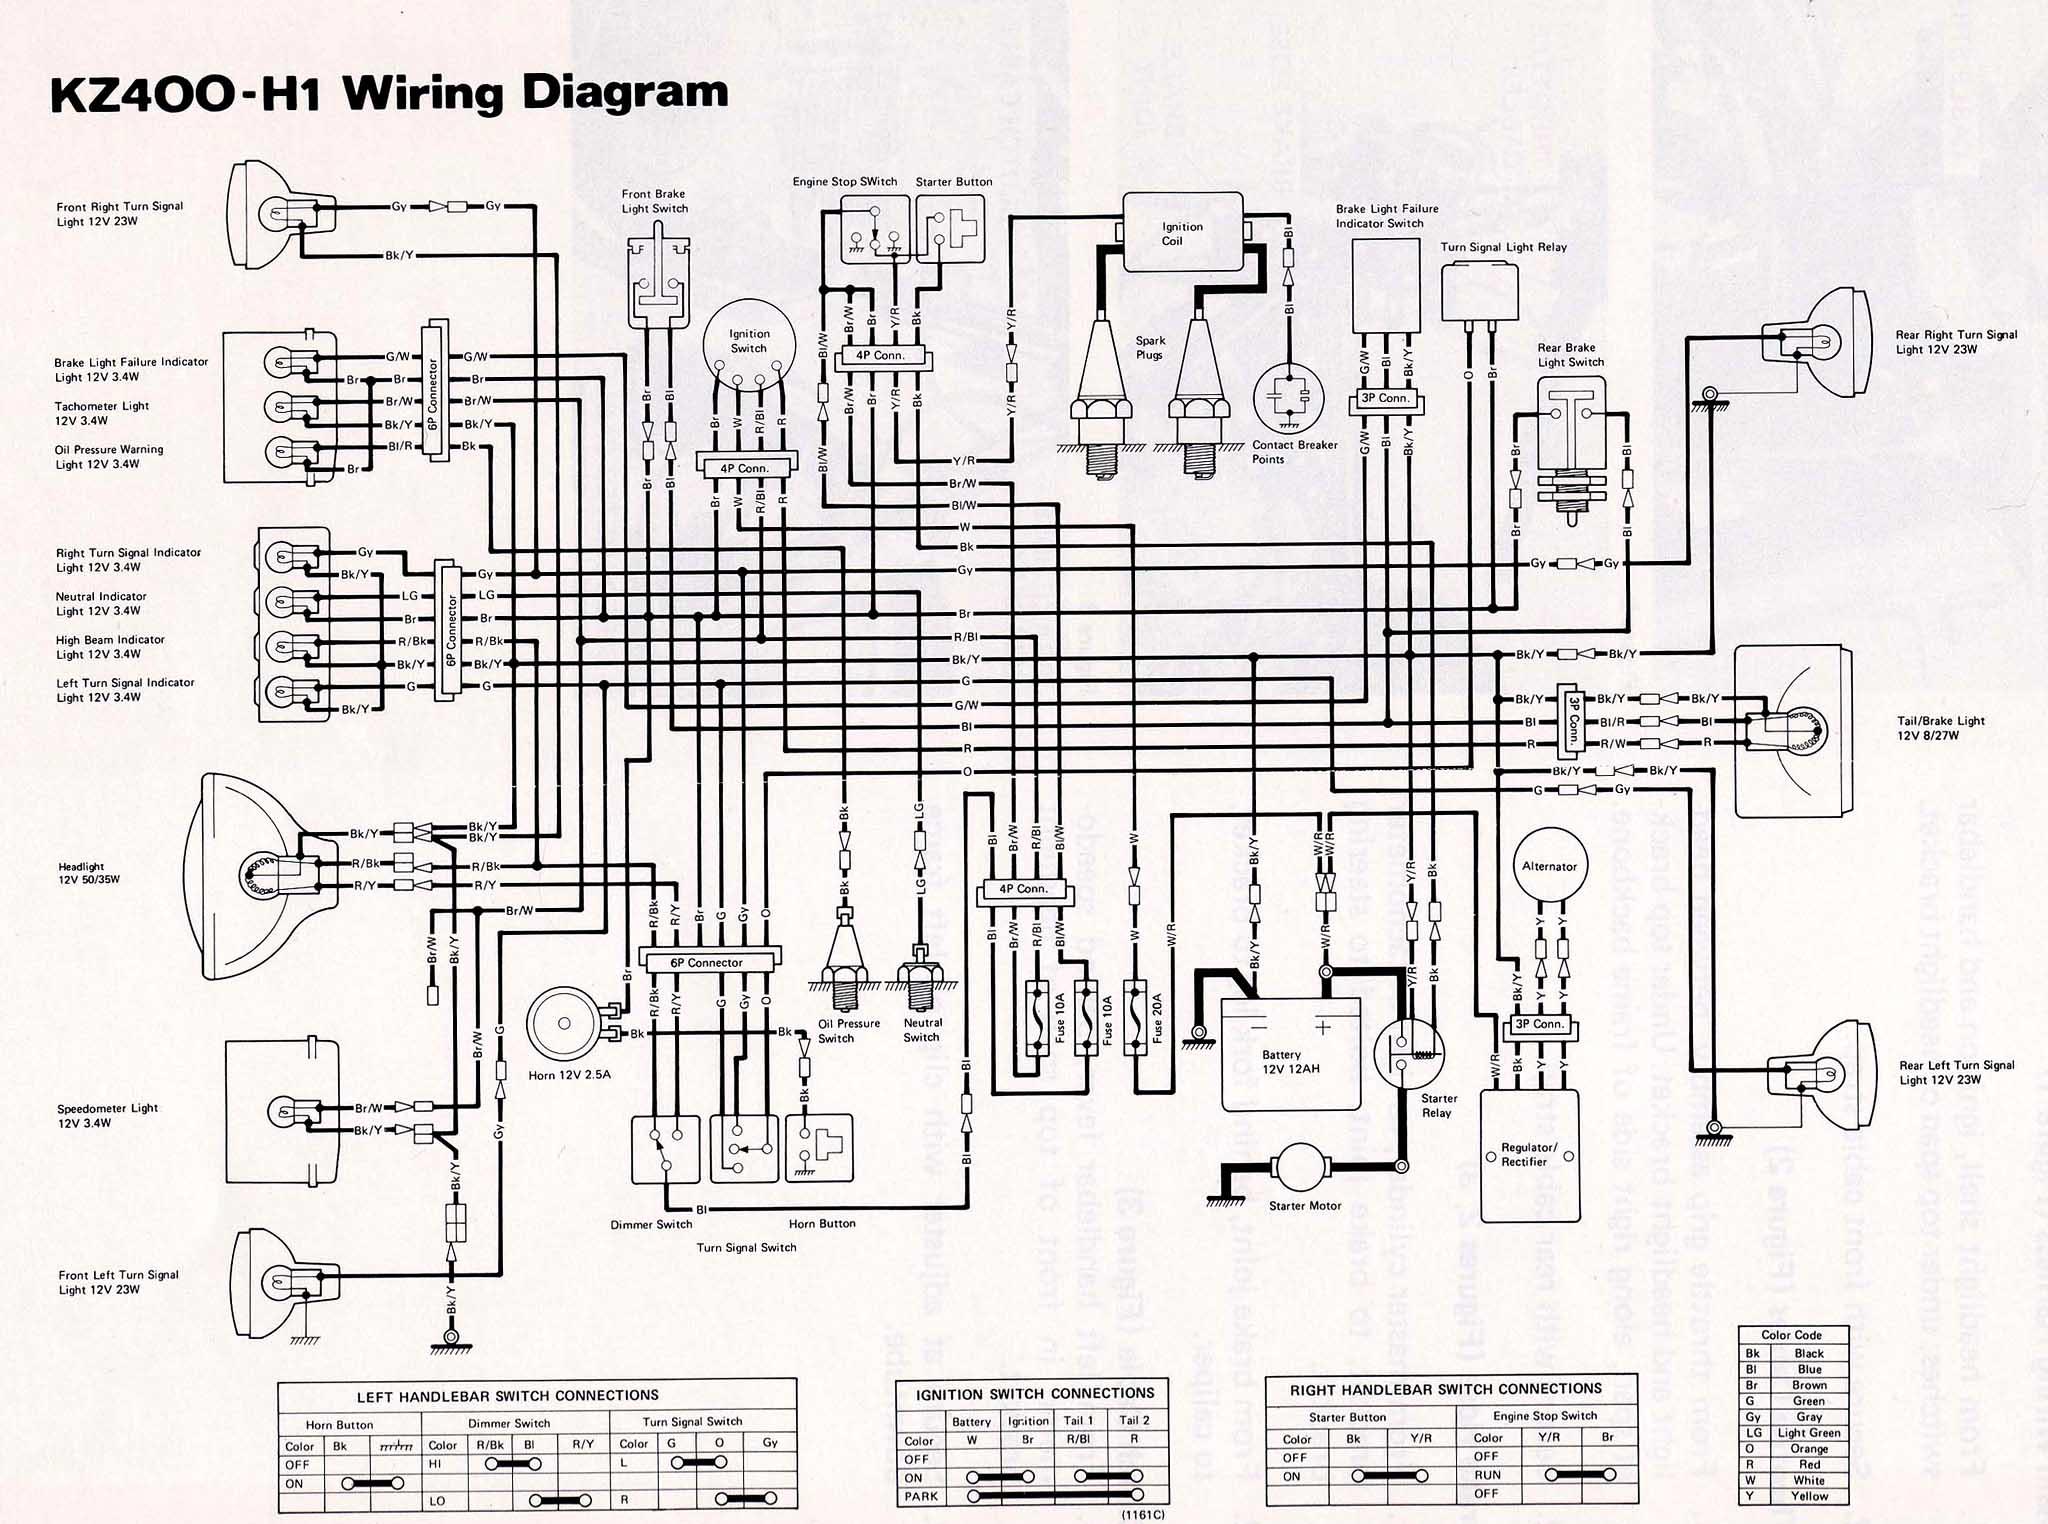 Wiring Diagram For Honda Cr250r - Auto Electrical Wiring Diagram on honda rc51 wiring diagram, honda cr250r wiring diagram, honda gl1100 wiring diagram, honda cb400 wiring diagram, honda cb500 wiring diagram, honda cr125 wiring diagram, honda xl500s wiring diagram, honda cx500 wiring diagram,